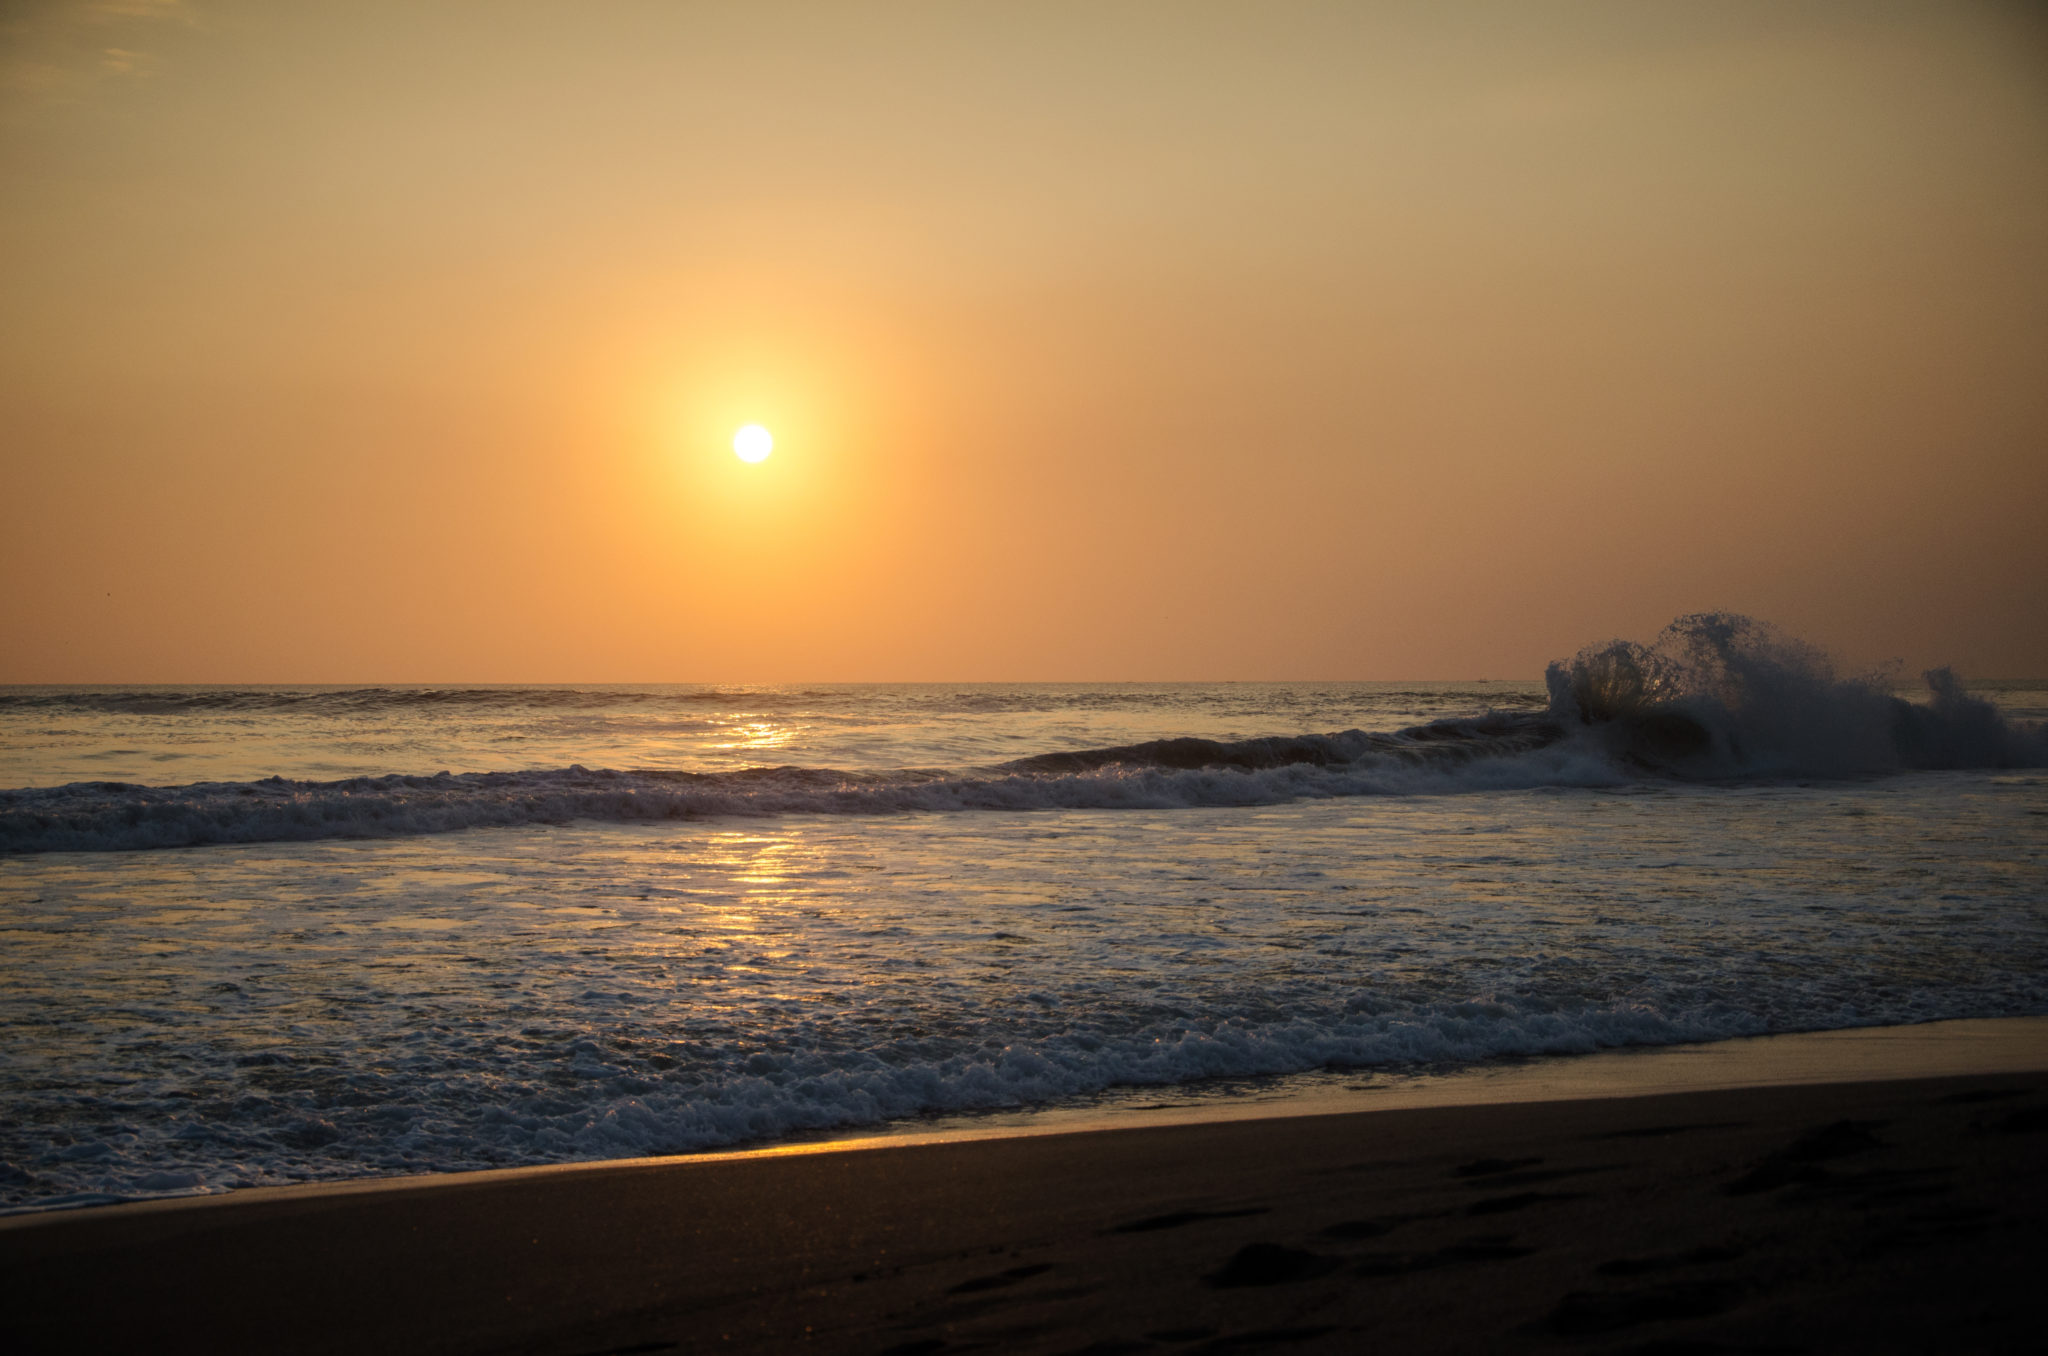 Indonesien-Reisetipps-Surfing-Seminyak